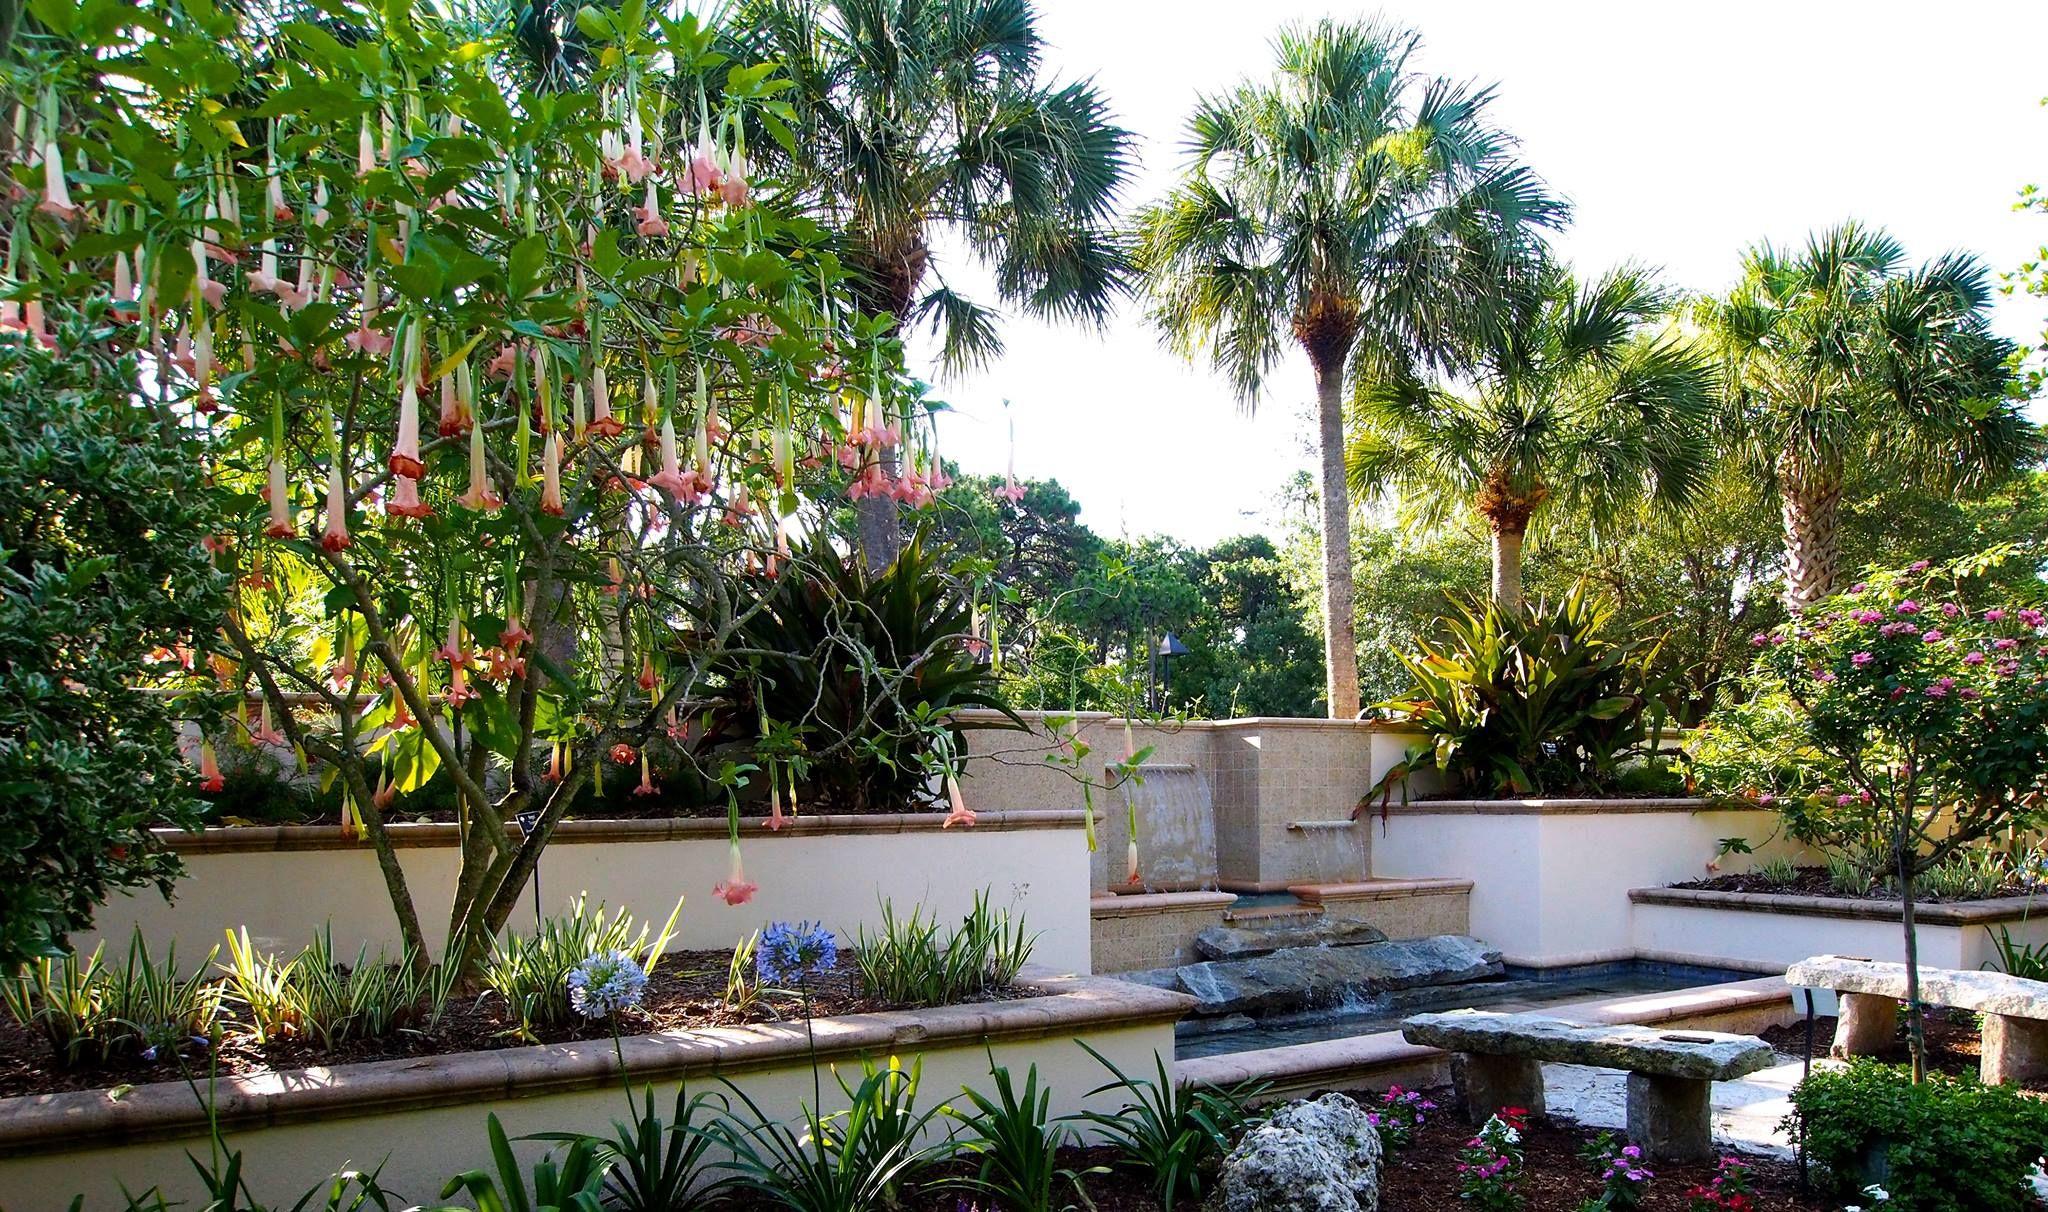 f9e3cef00b87bc43b8219c00bfd74601 - The Florida Botanical Gardens In Largo